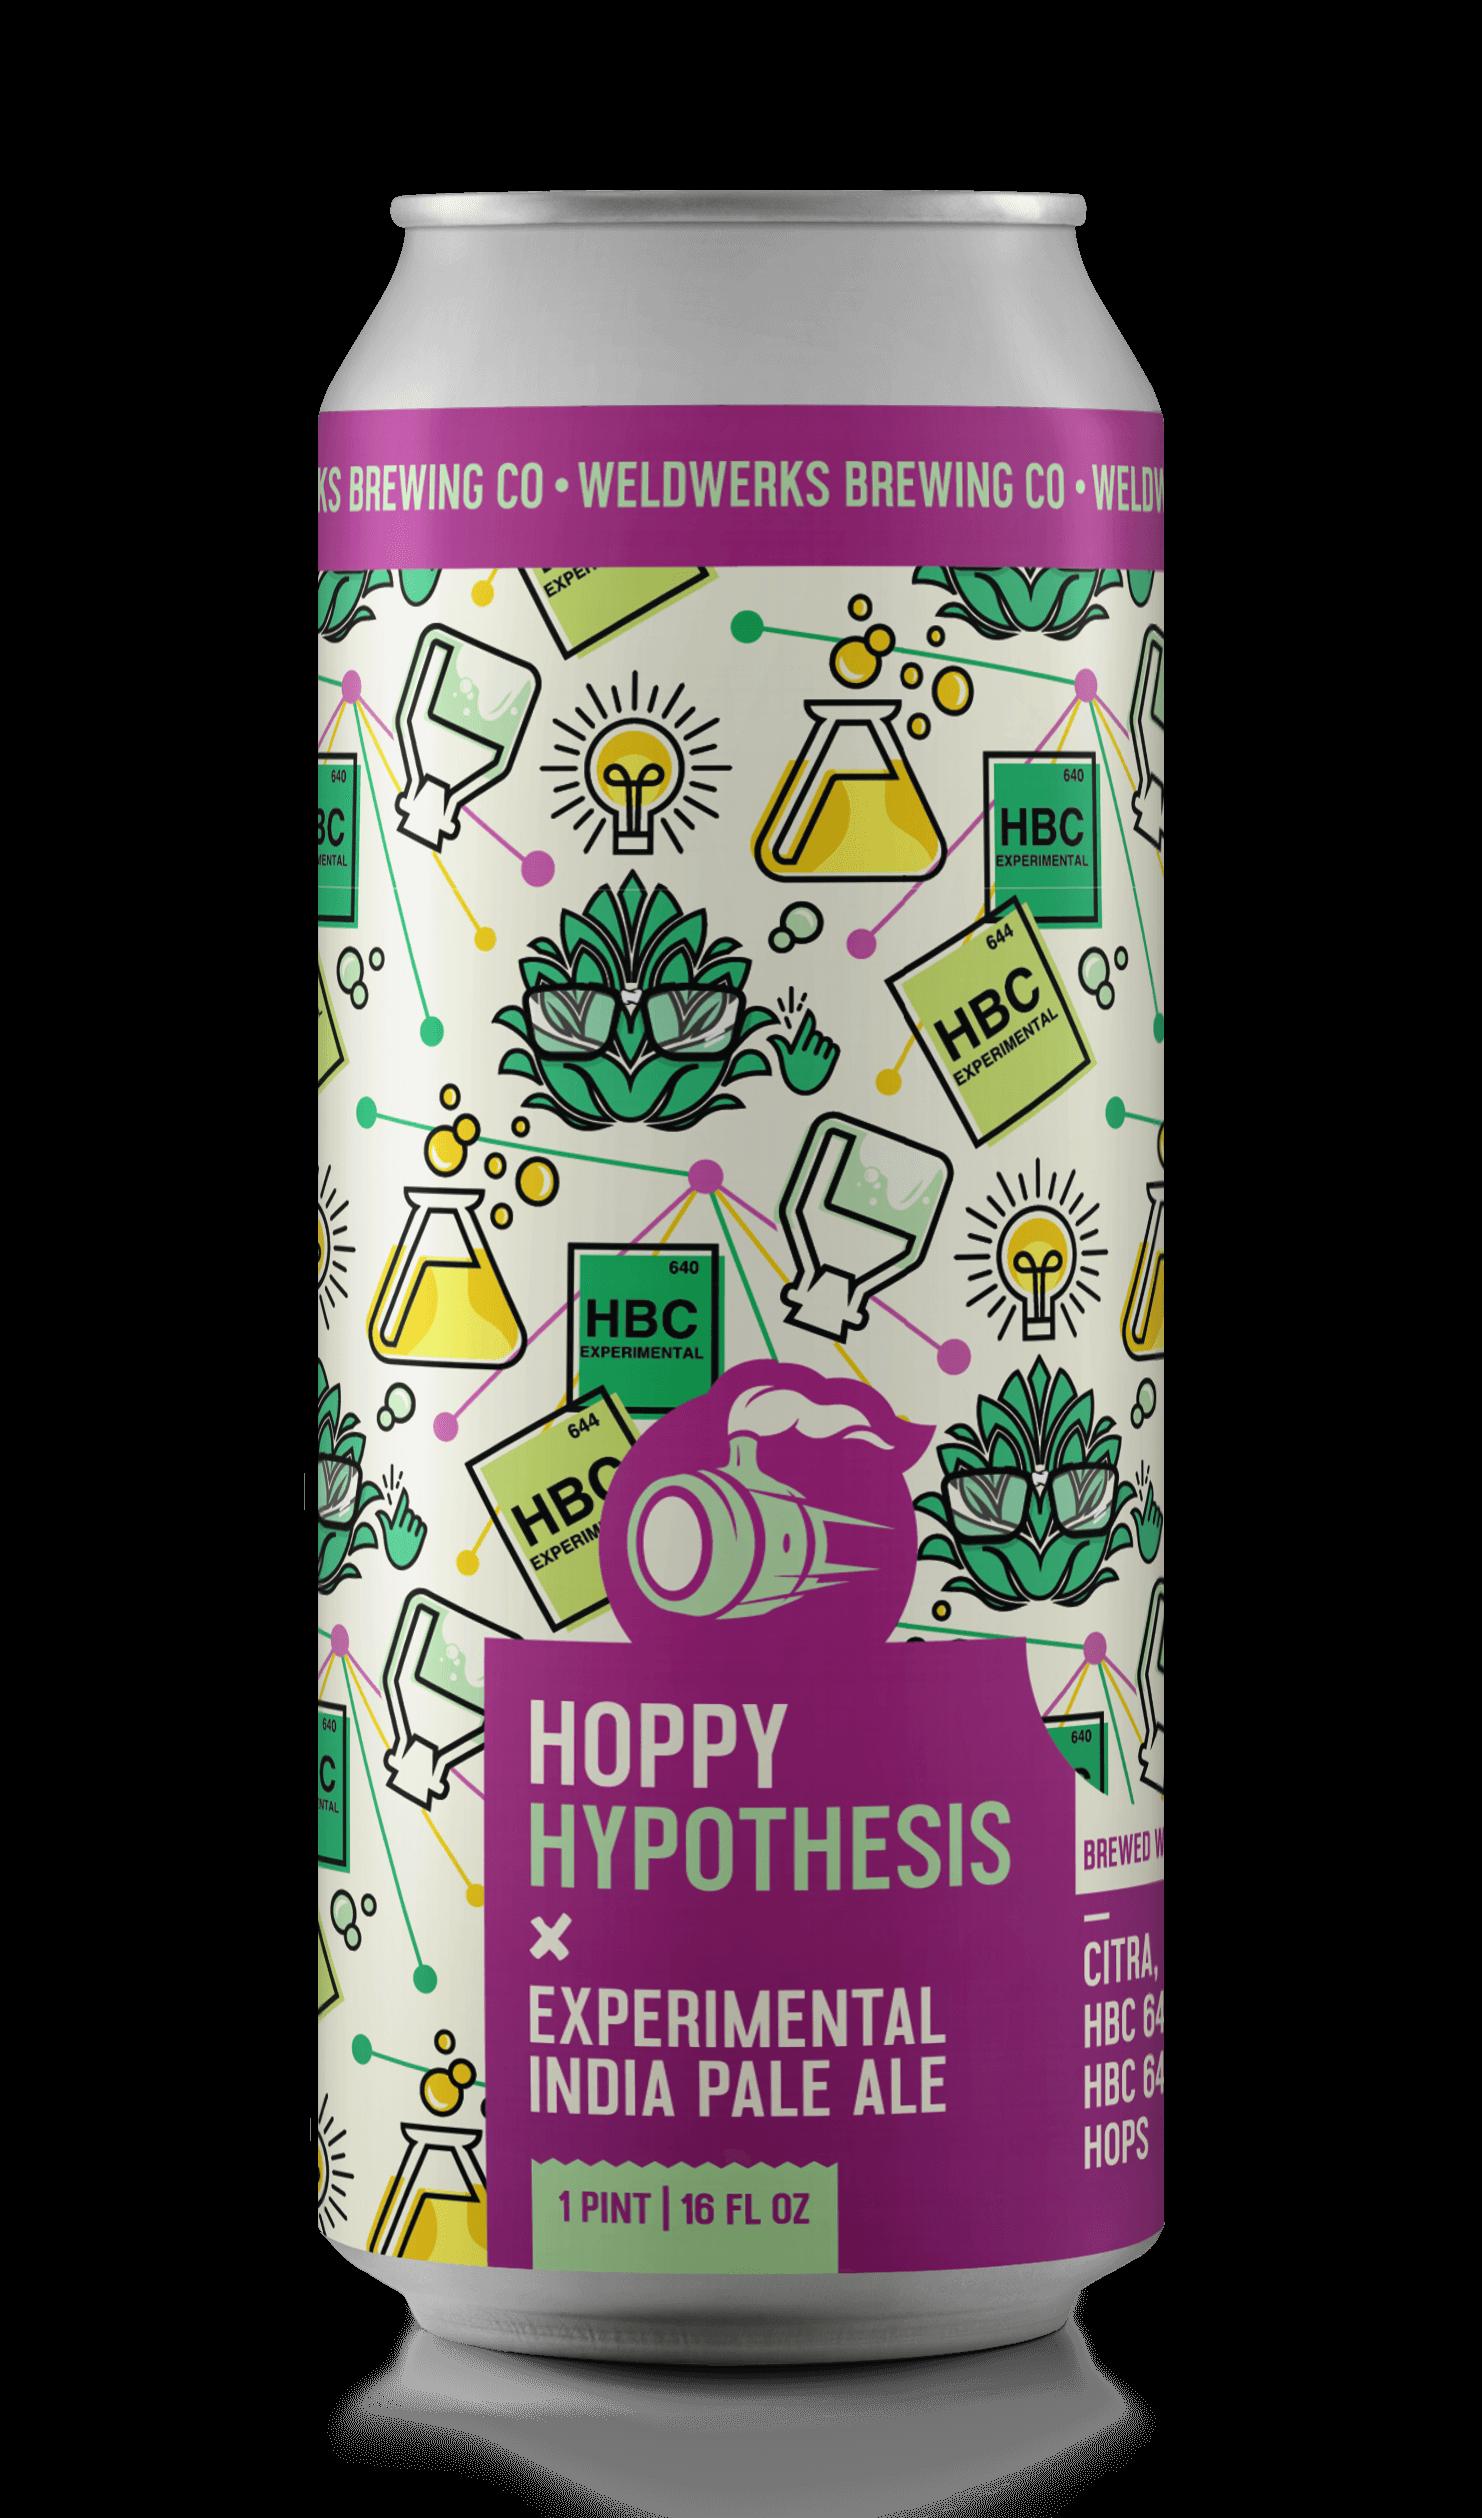 Hoppy Hypothesis